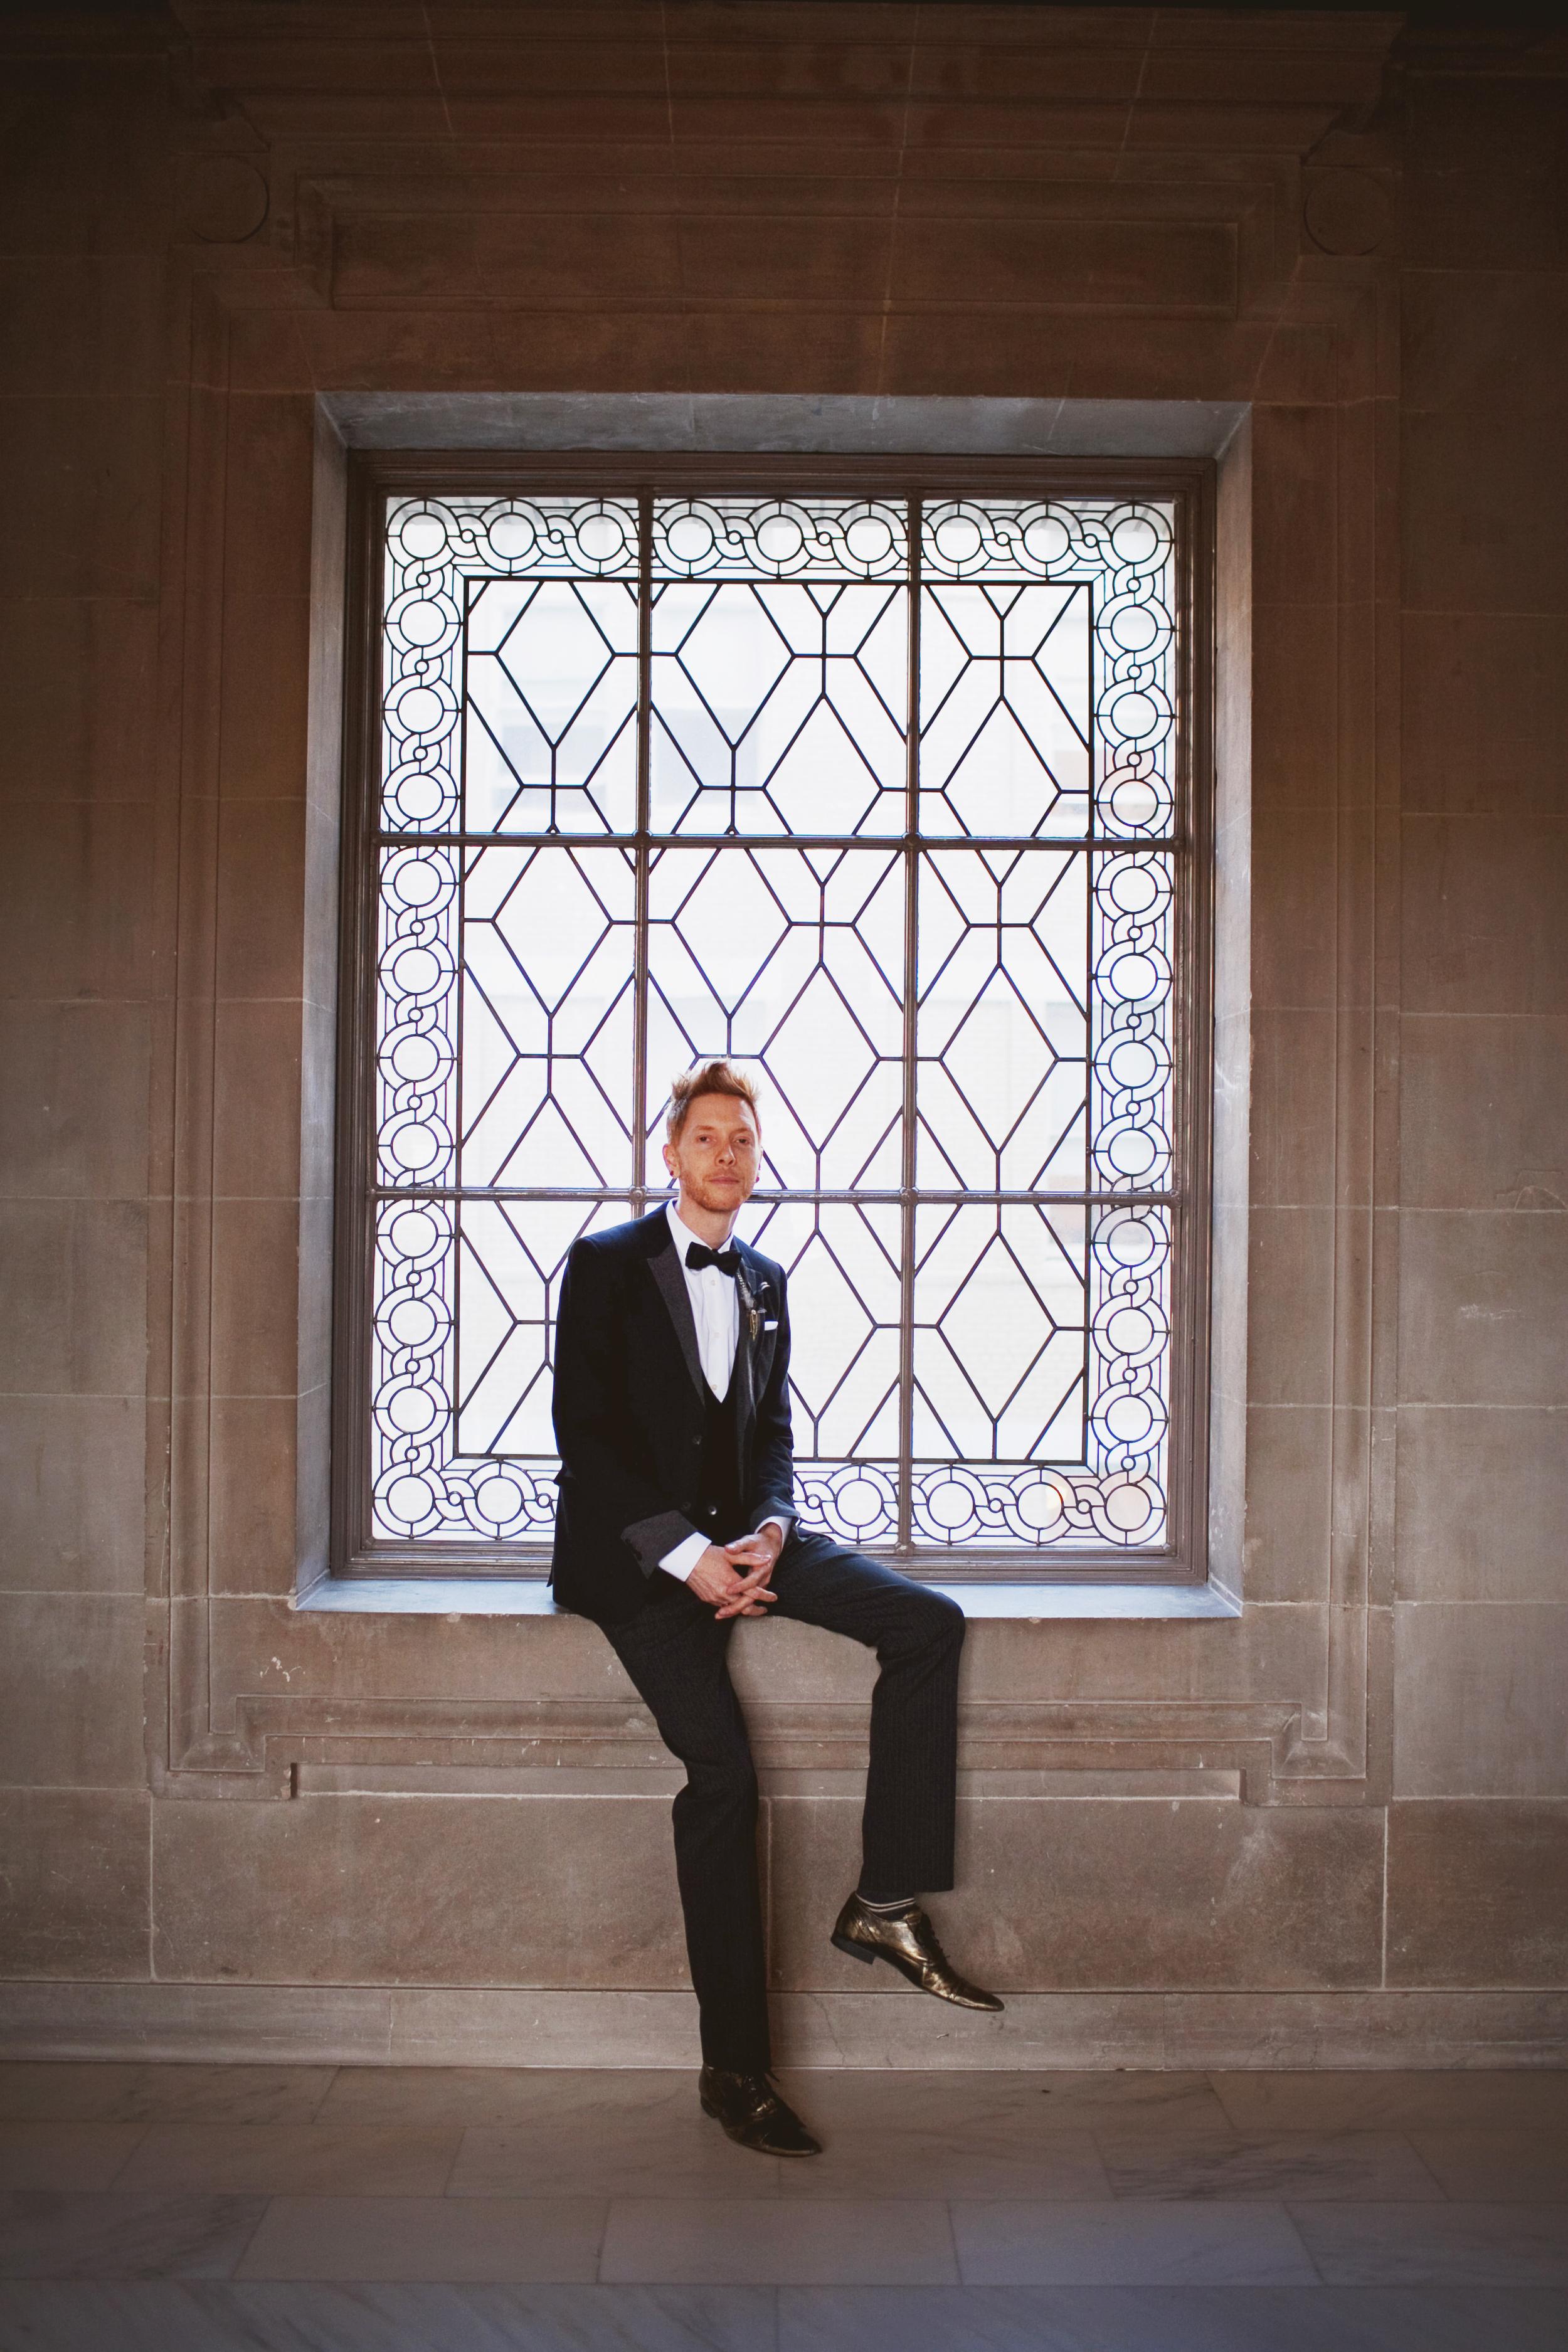 San_Francisco_City_Hall_Wedding_Photography_Cori_EB-03.JPG